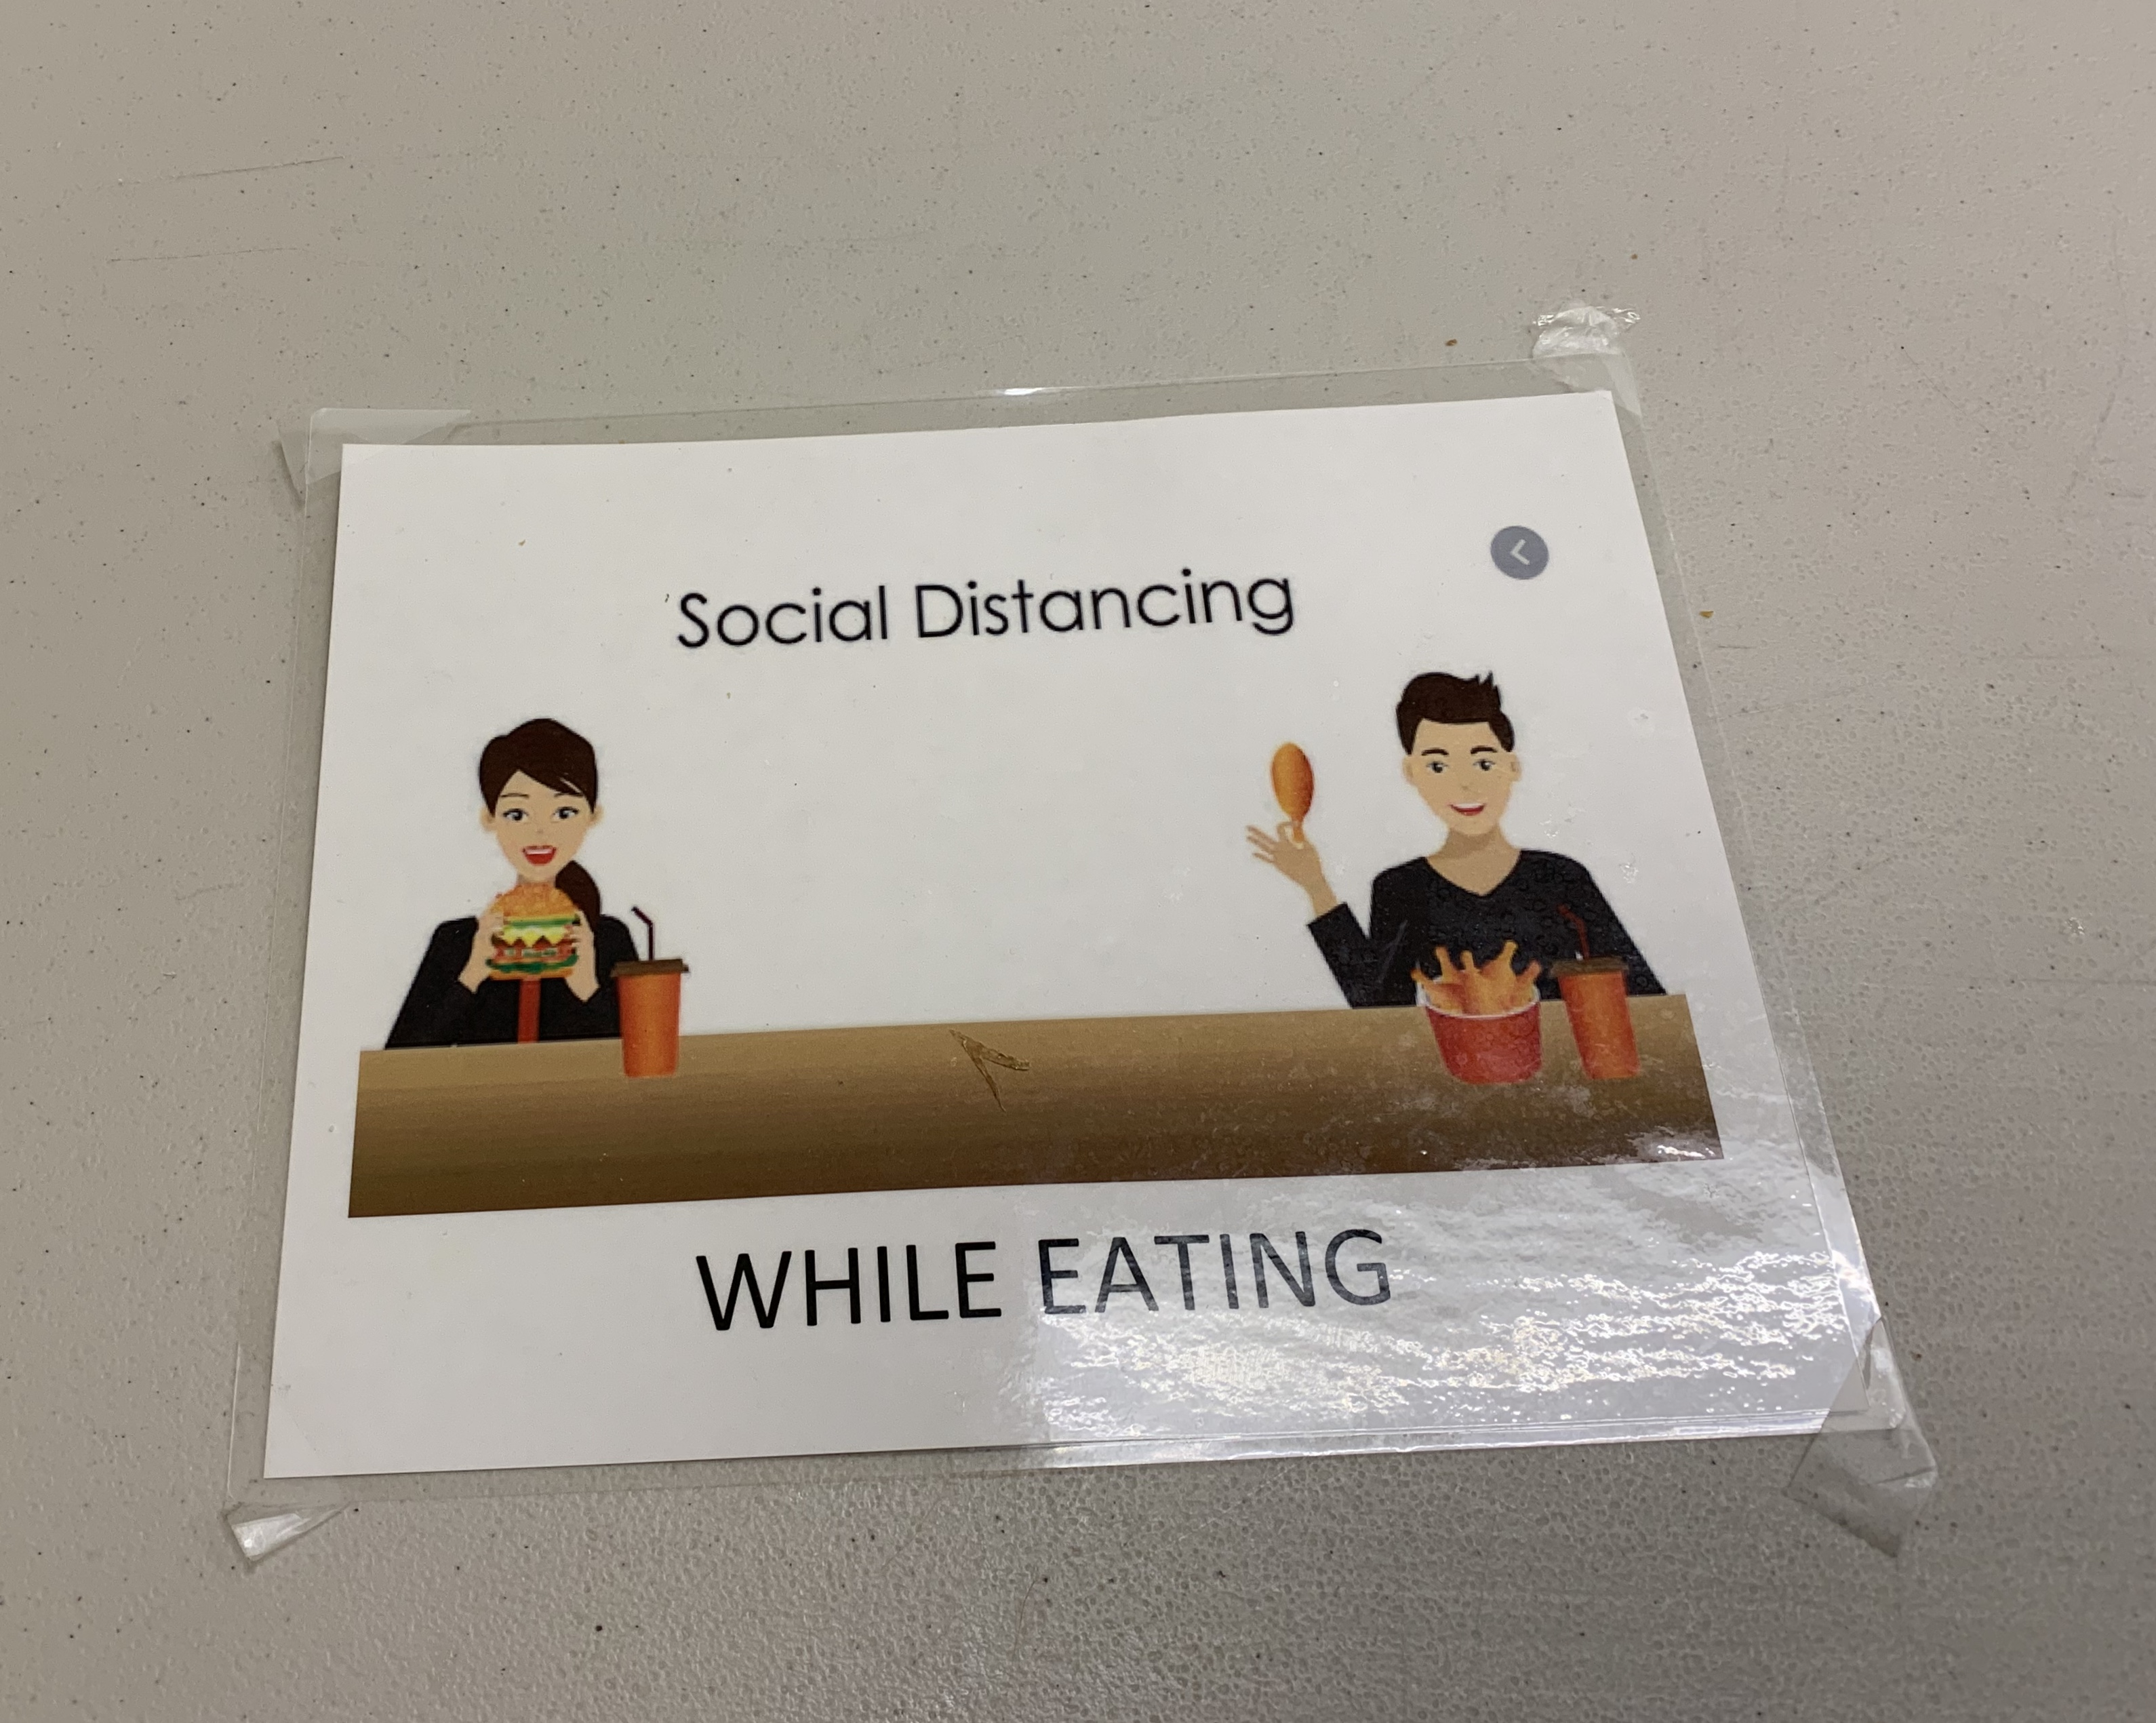 EatingRule